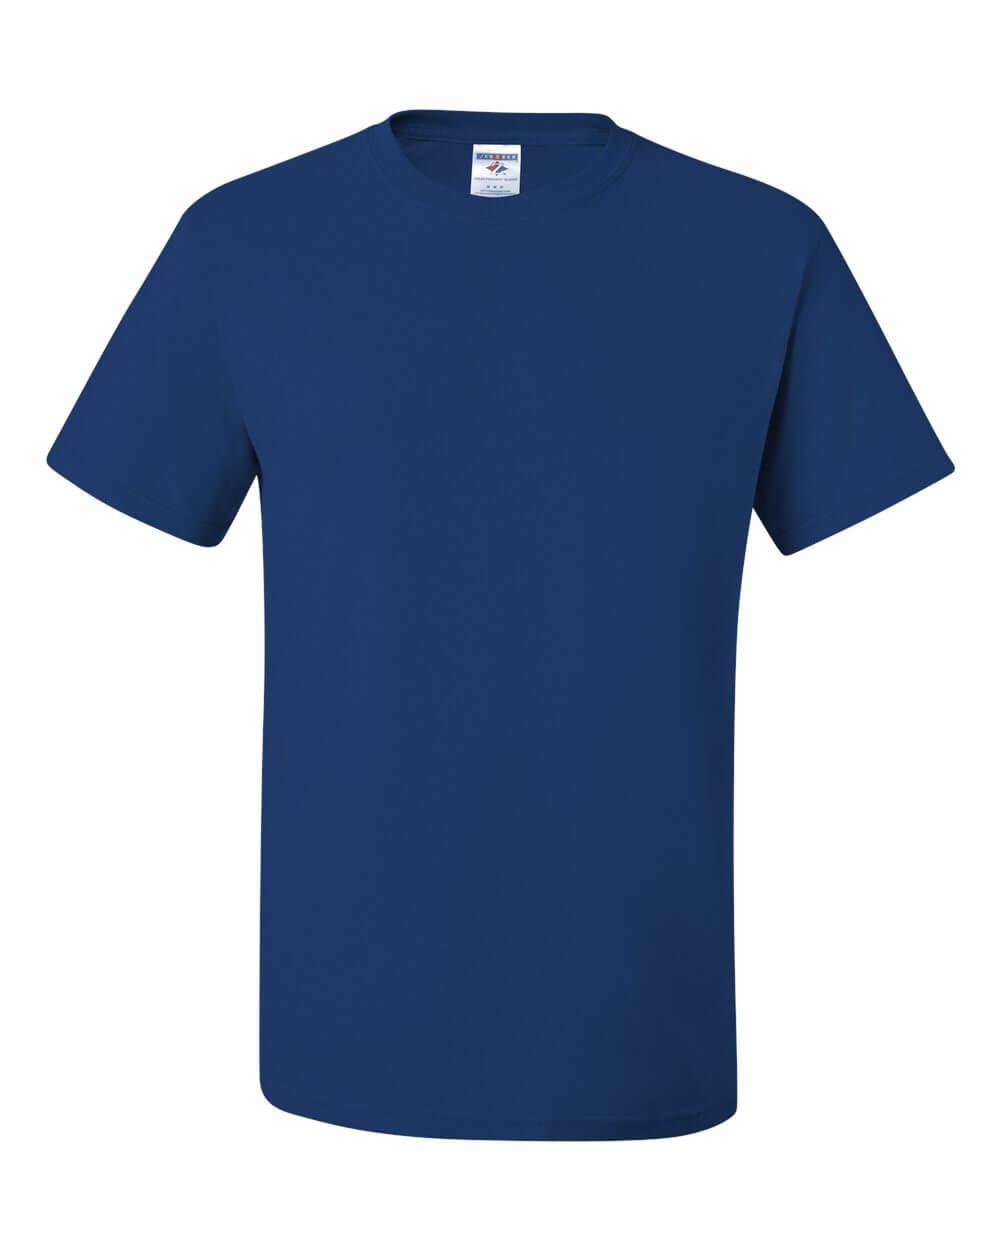 Jerzees_29MR_Royal Blue Custom T Shirts